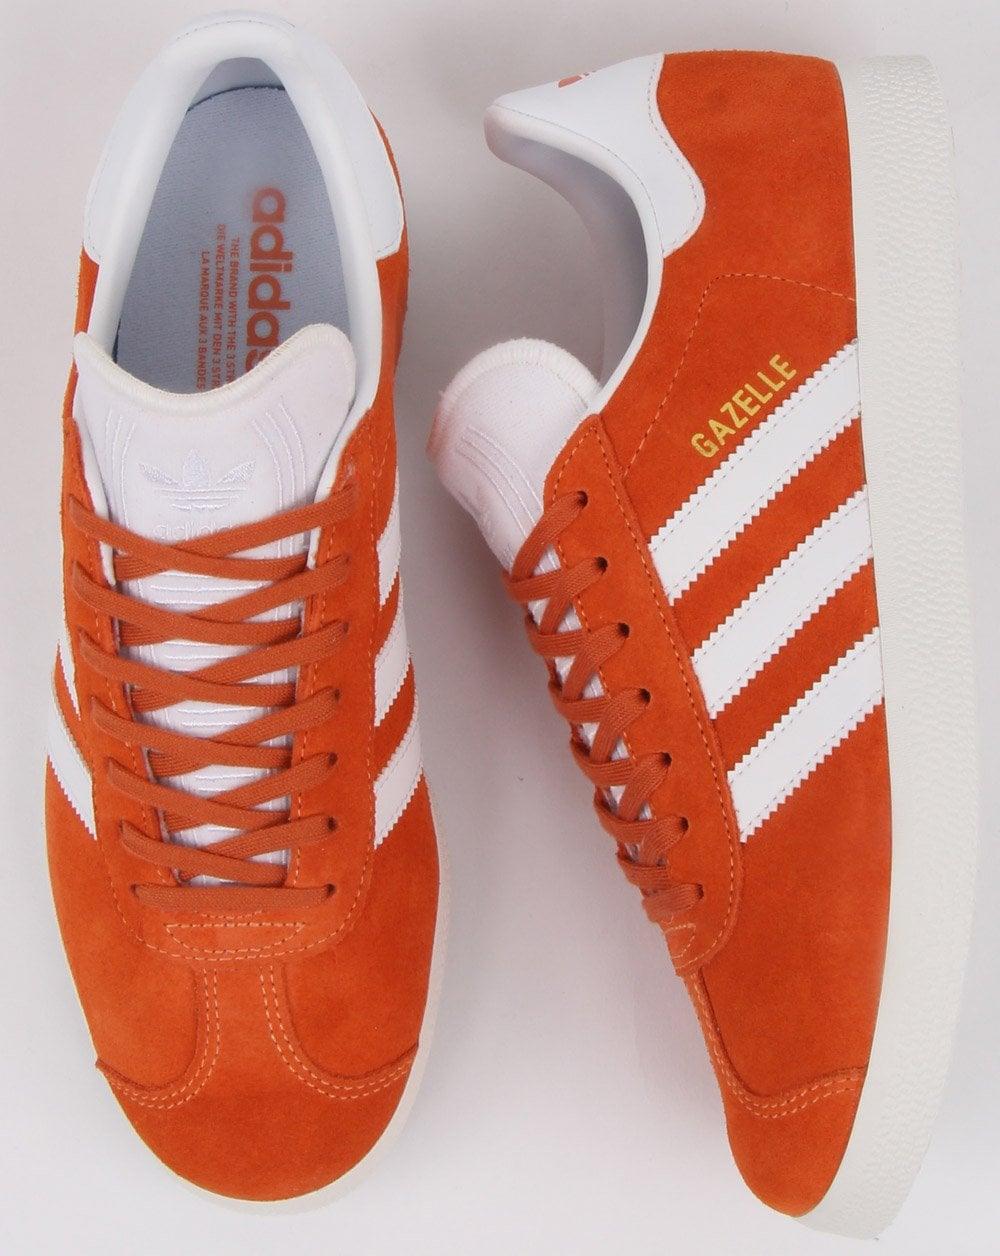 competitive price f6ecb 40e10 adidas Trainers Adidas Gazelle Trainers Orange white